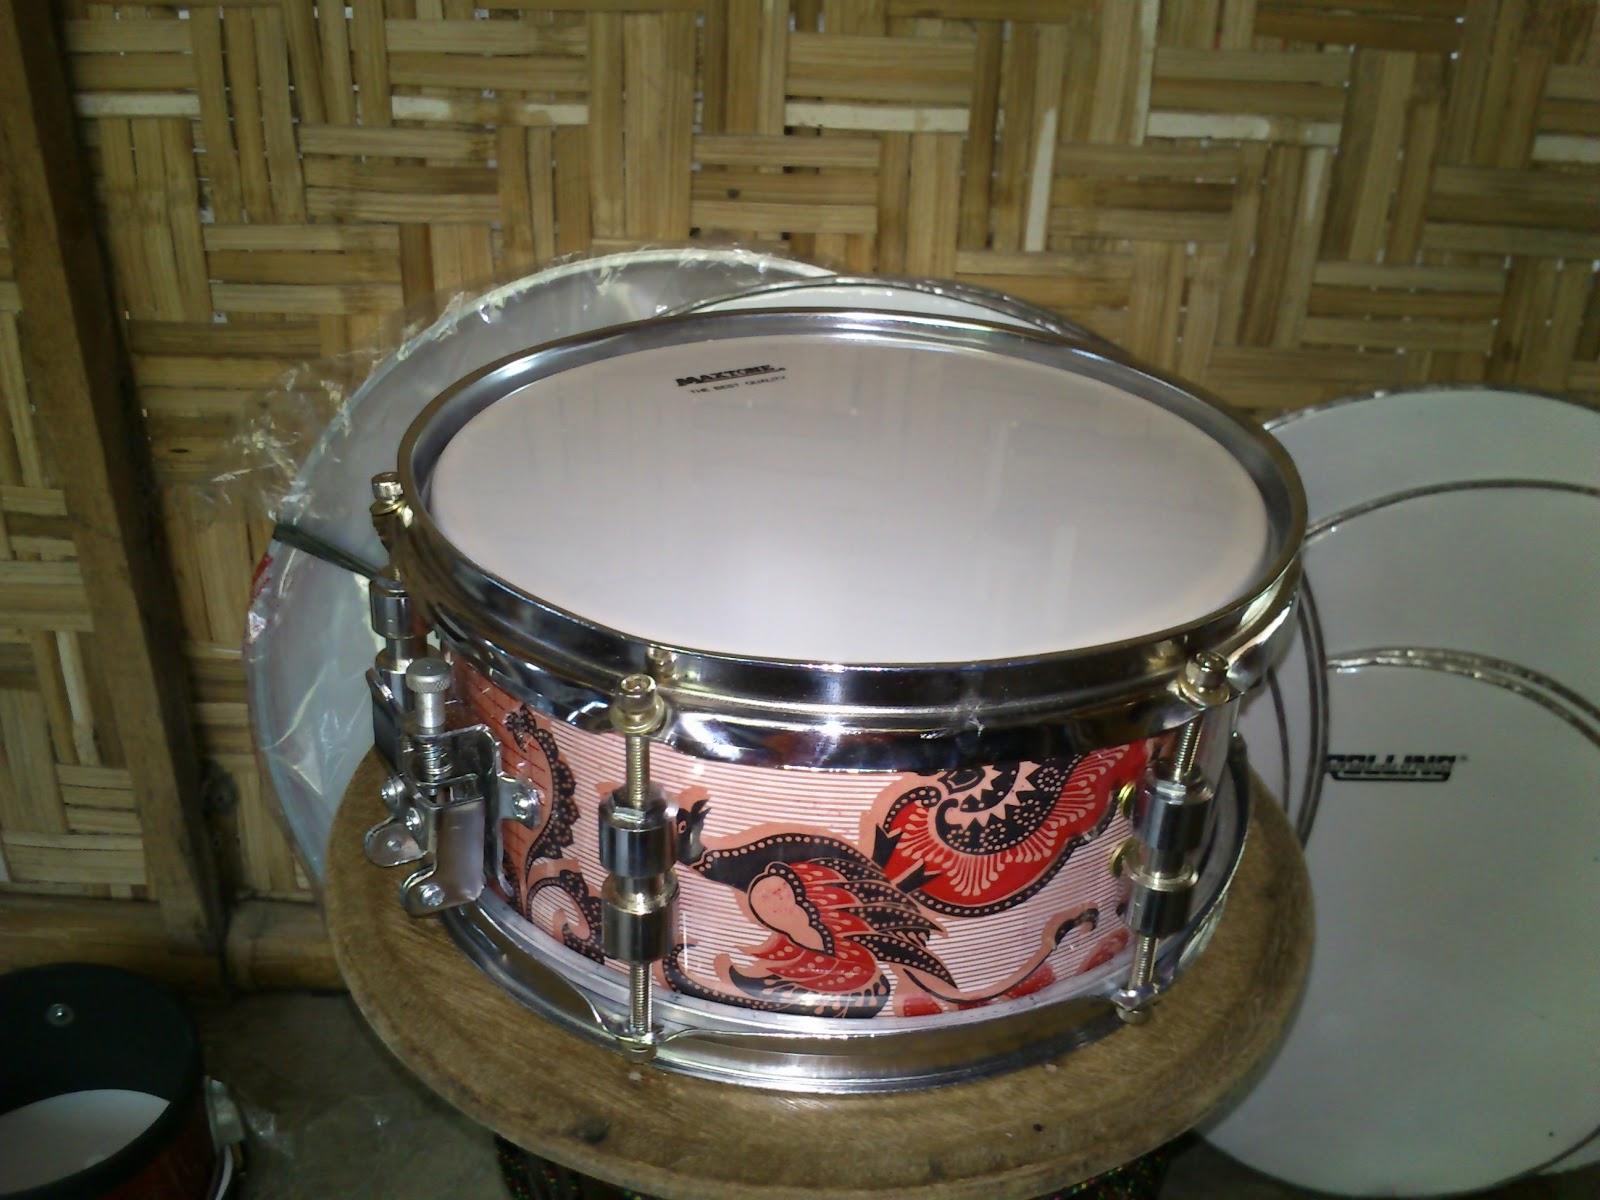 perajin drumband bedug ketipung dll snar drum pikollo ukuran 10. Black Bedroom Furniture Sets. Home Design Ideas